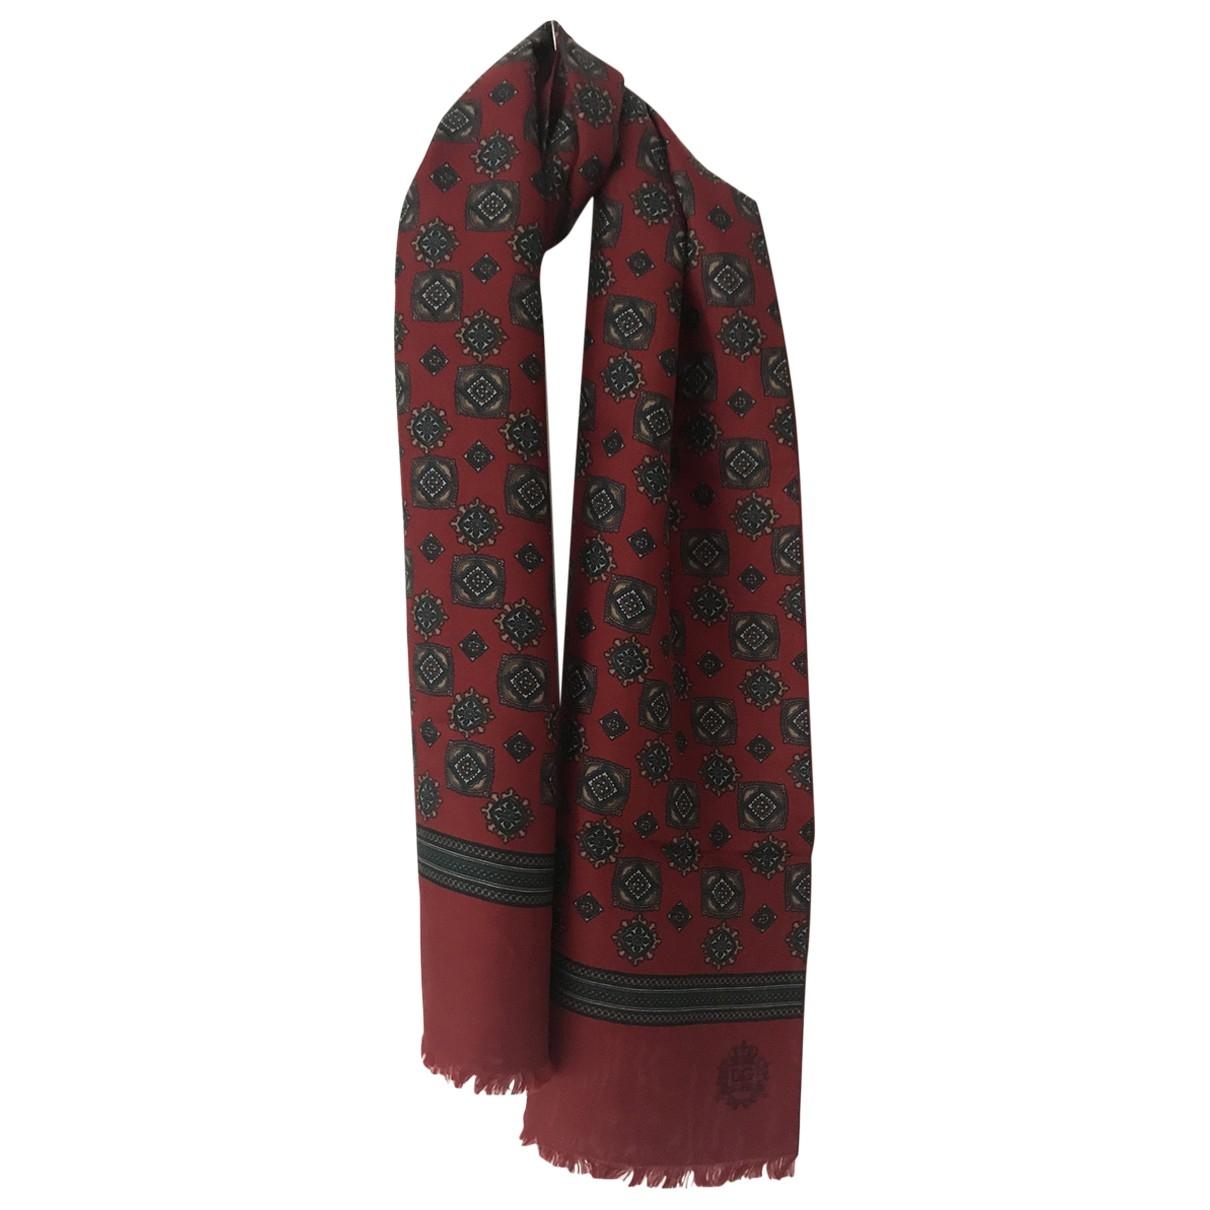 Dolce & Gabbana \N Red Silk scarf & pocket squares for Men \N